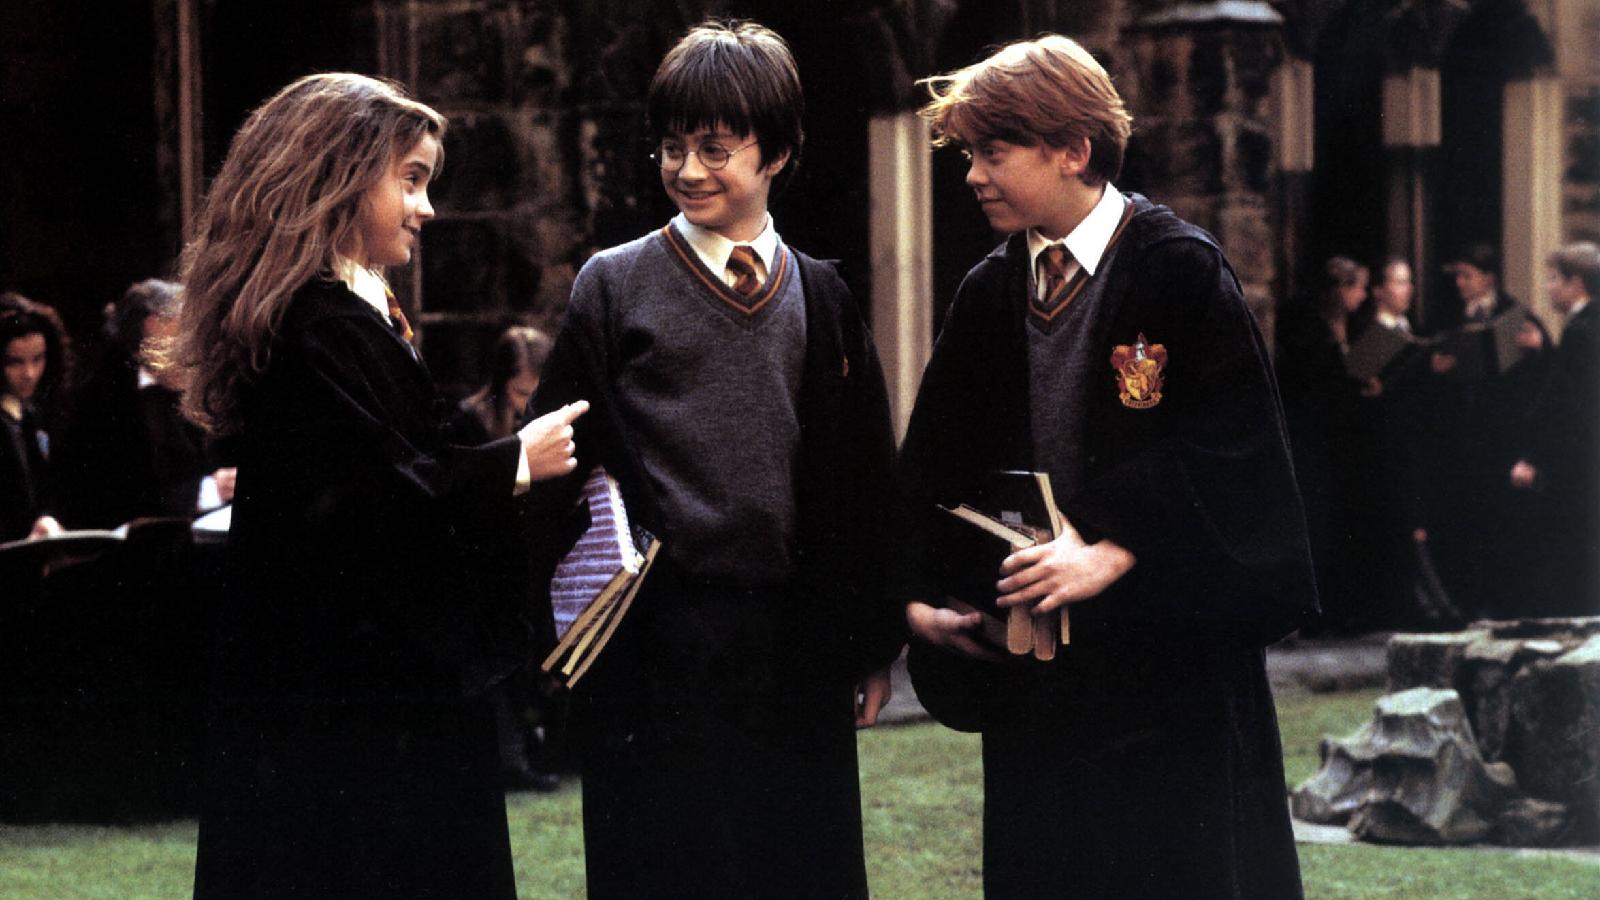 Die umstrittenste Szene in Harry Potter